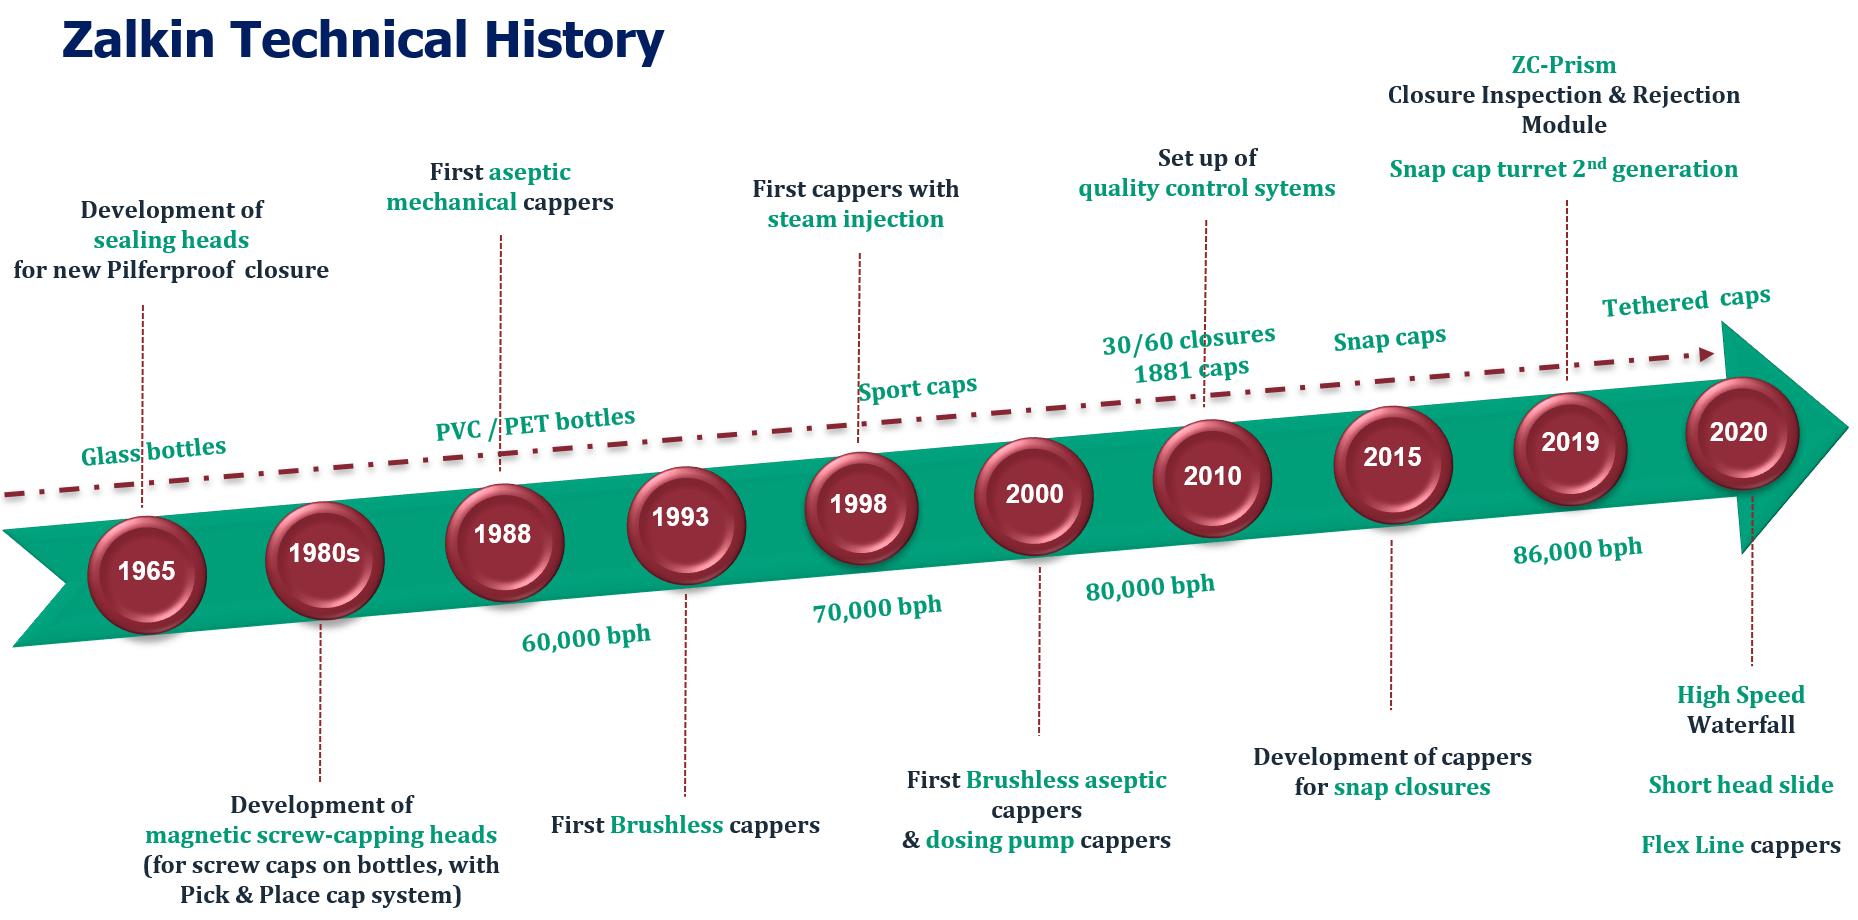 Zalkin Technical History Timeline 2019 10